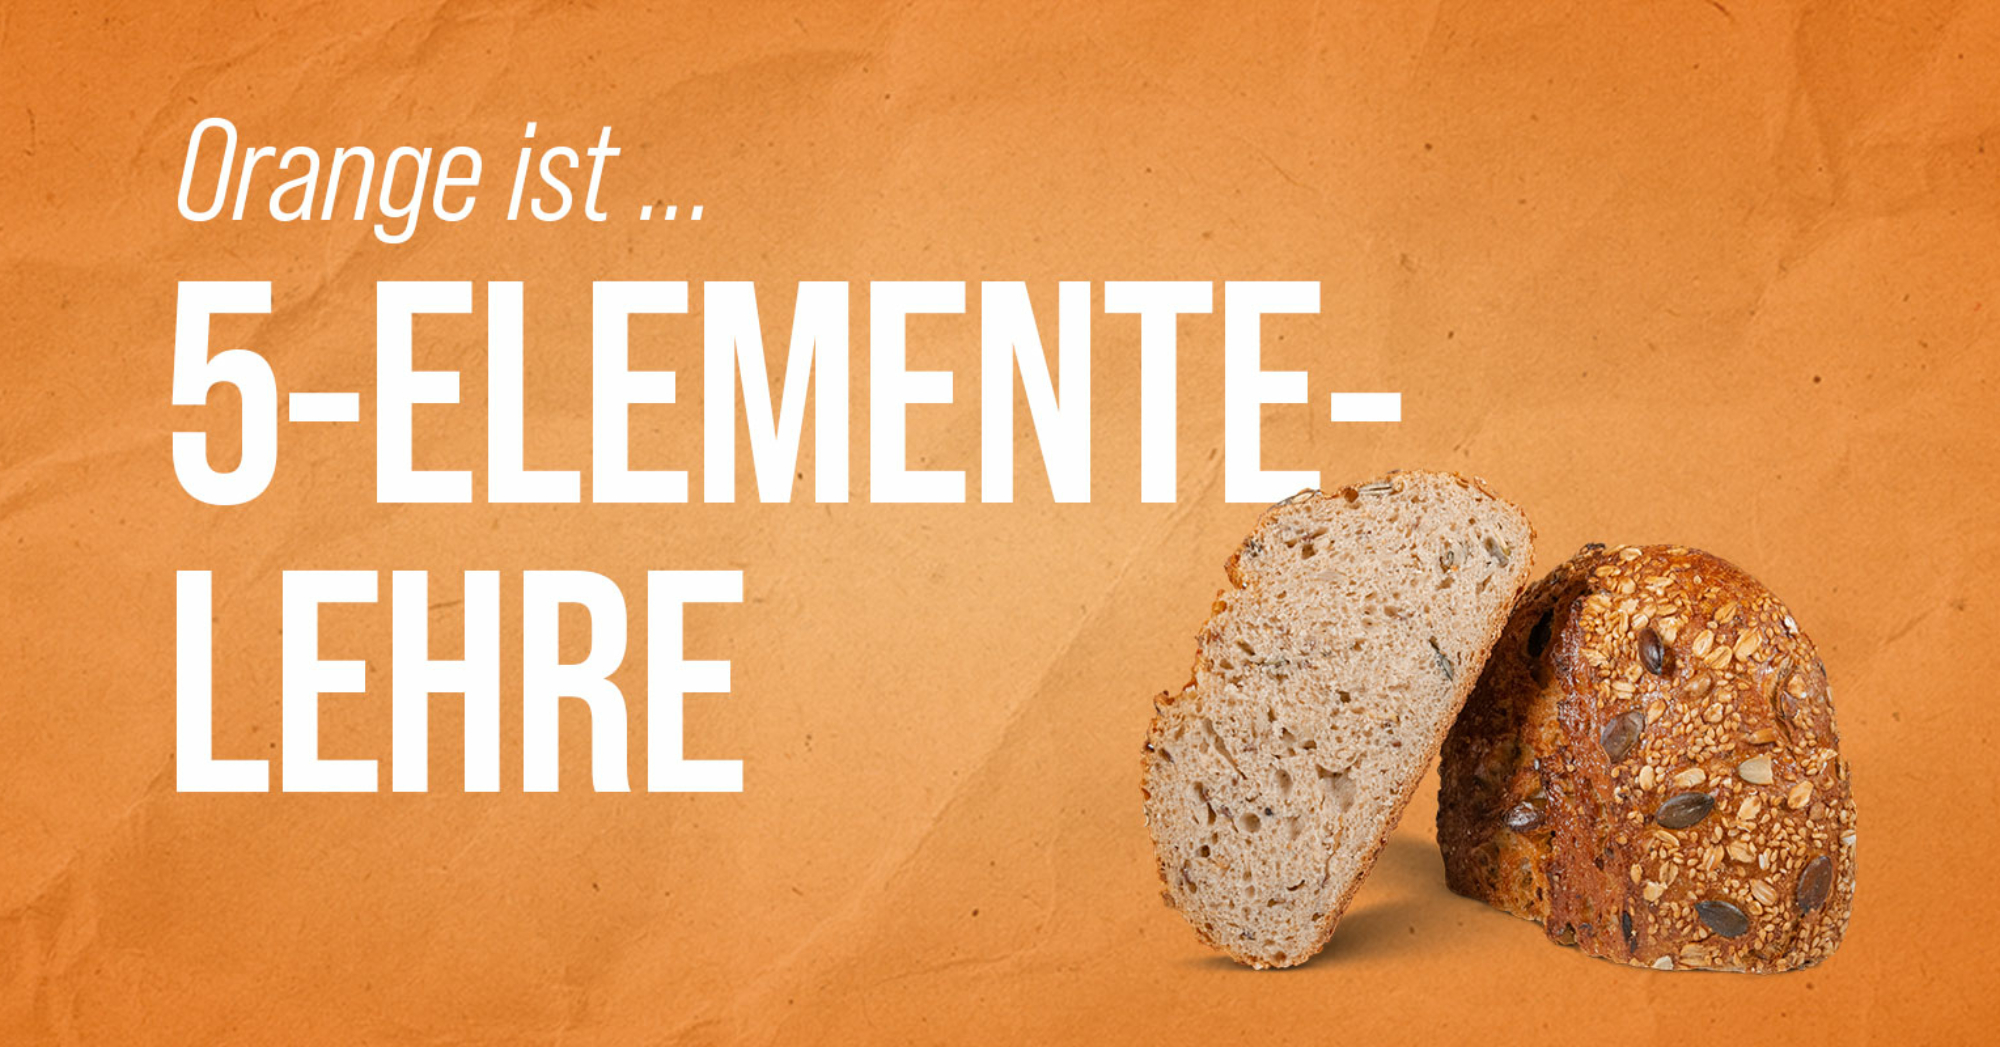 210423_5-Elemente-Brot_5-Elemente-Lehre_2161x800